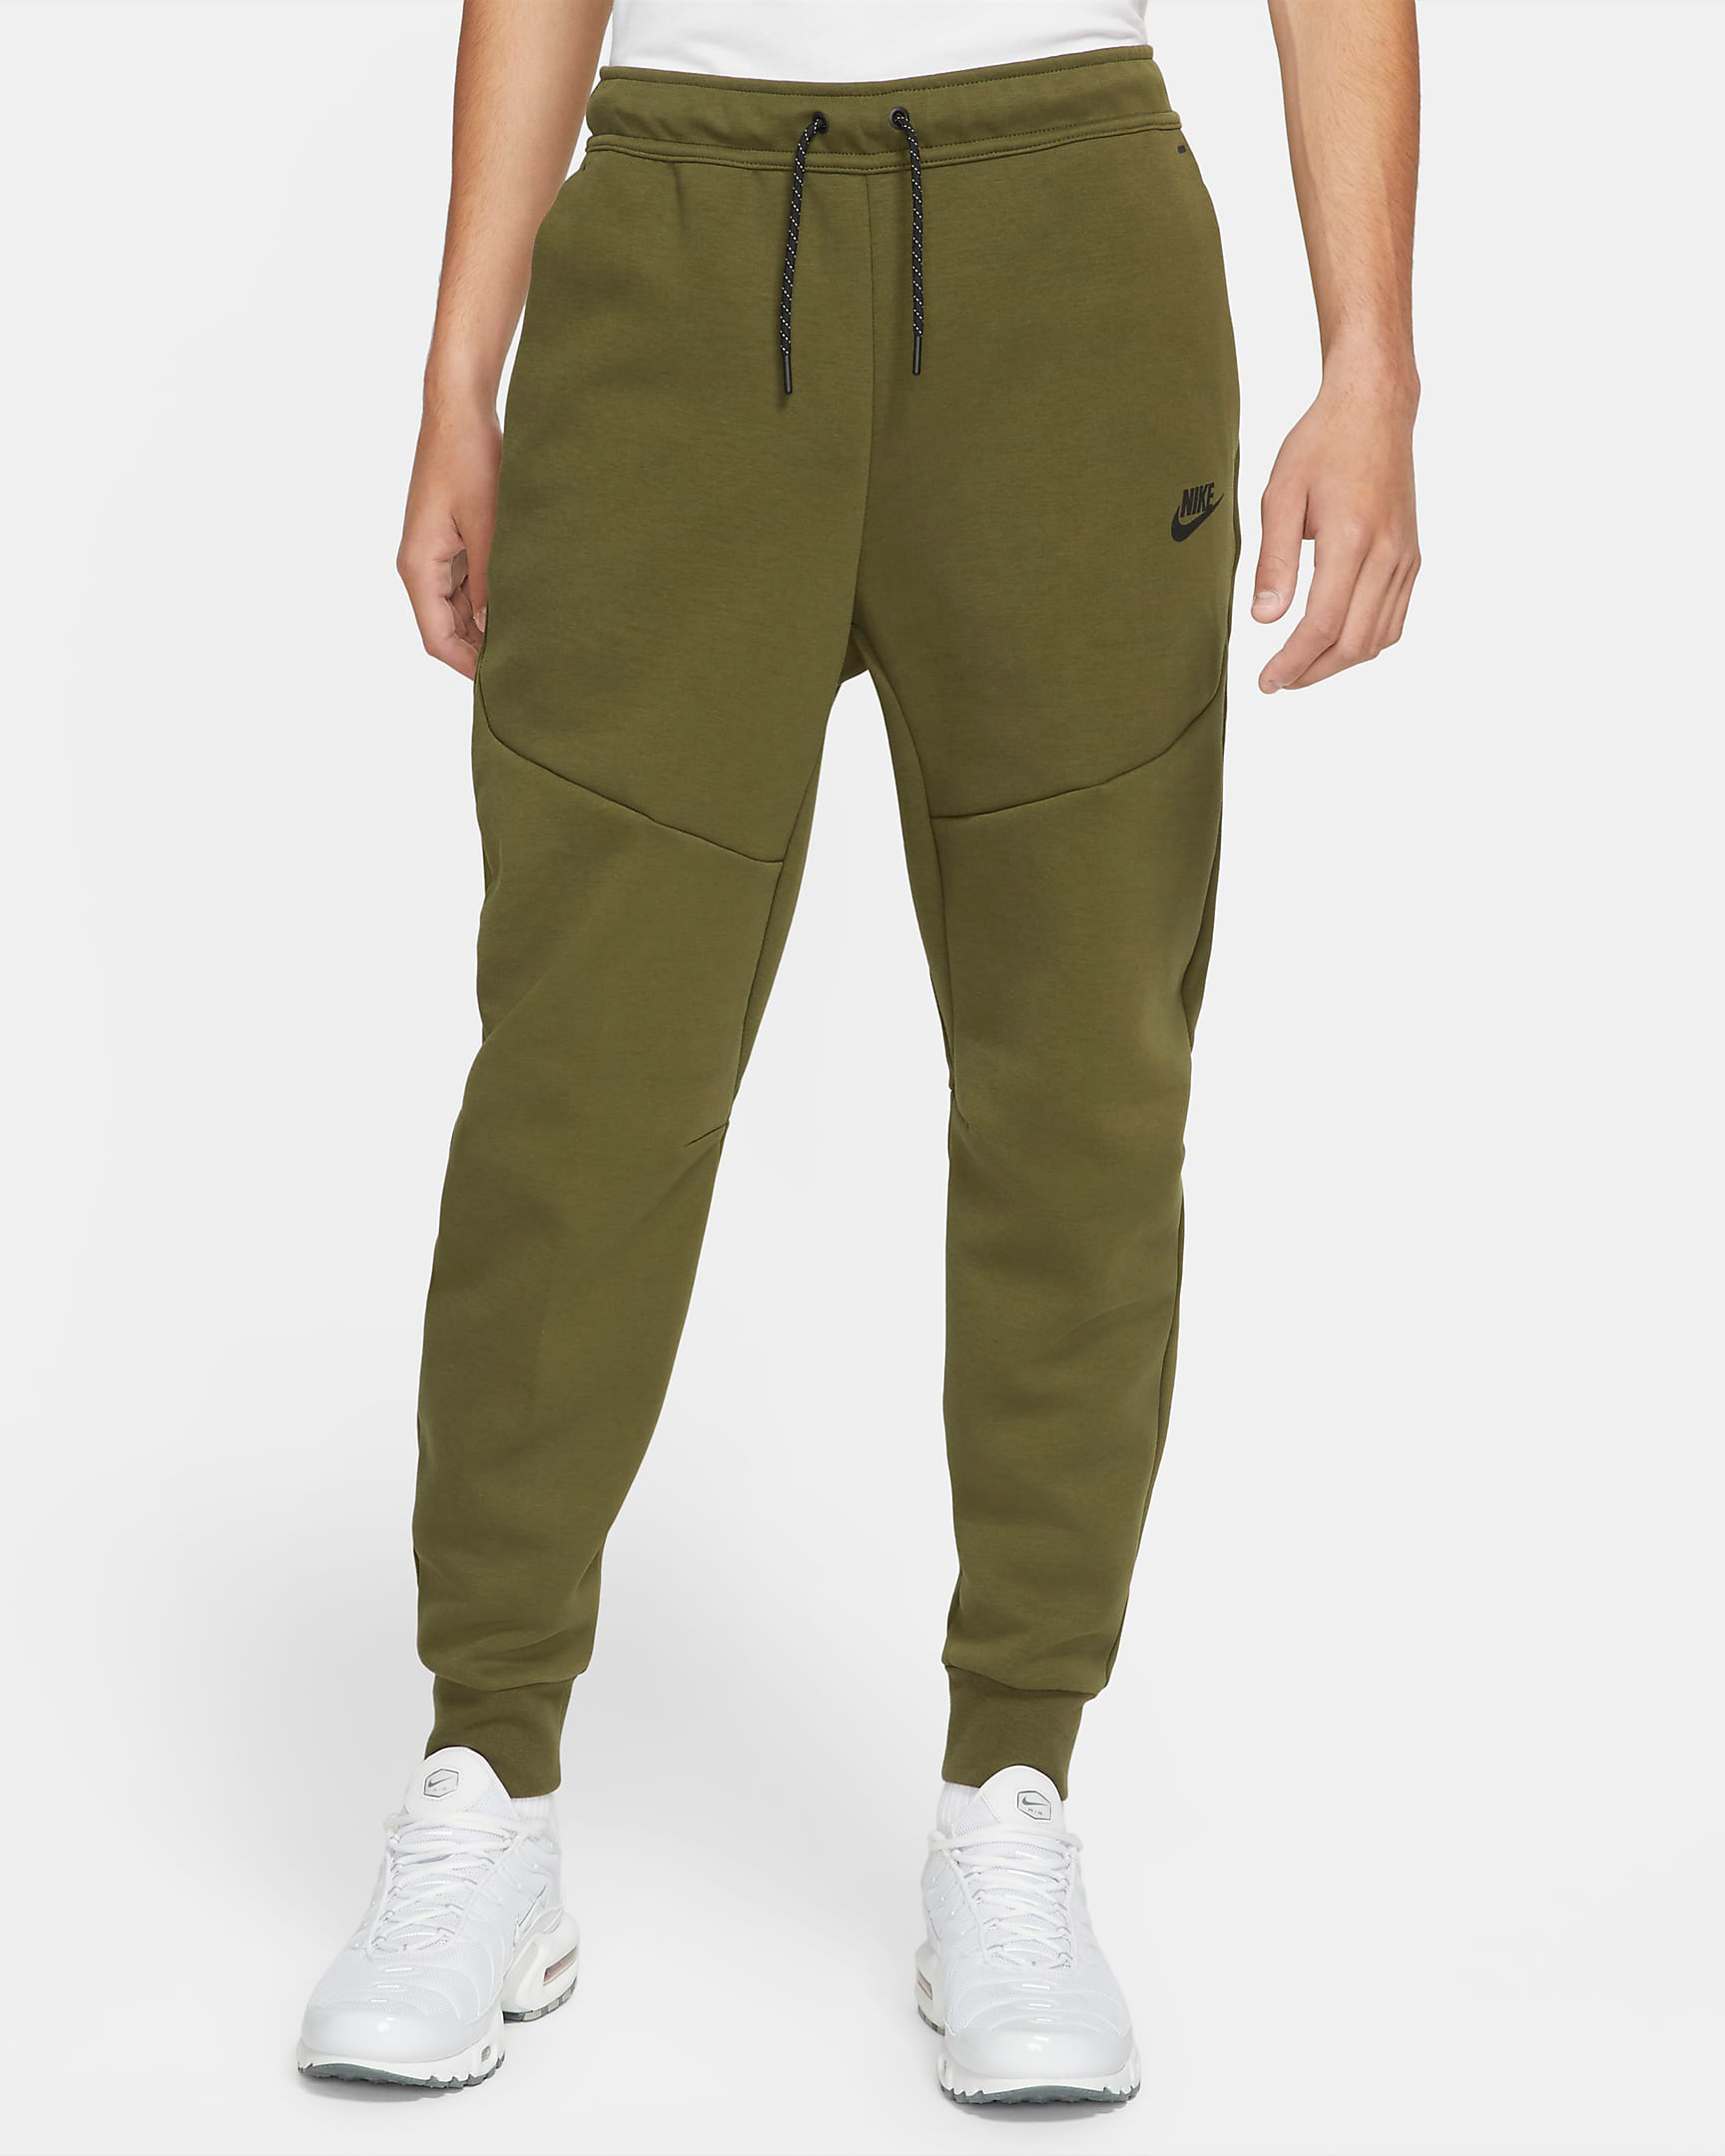 nike-rough-green-tech-fleece-joggers-pants-1